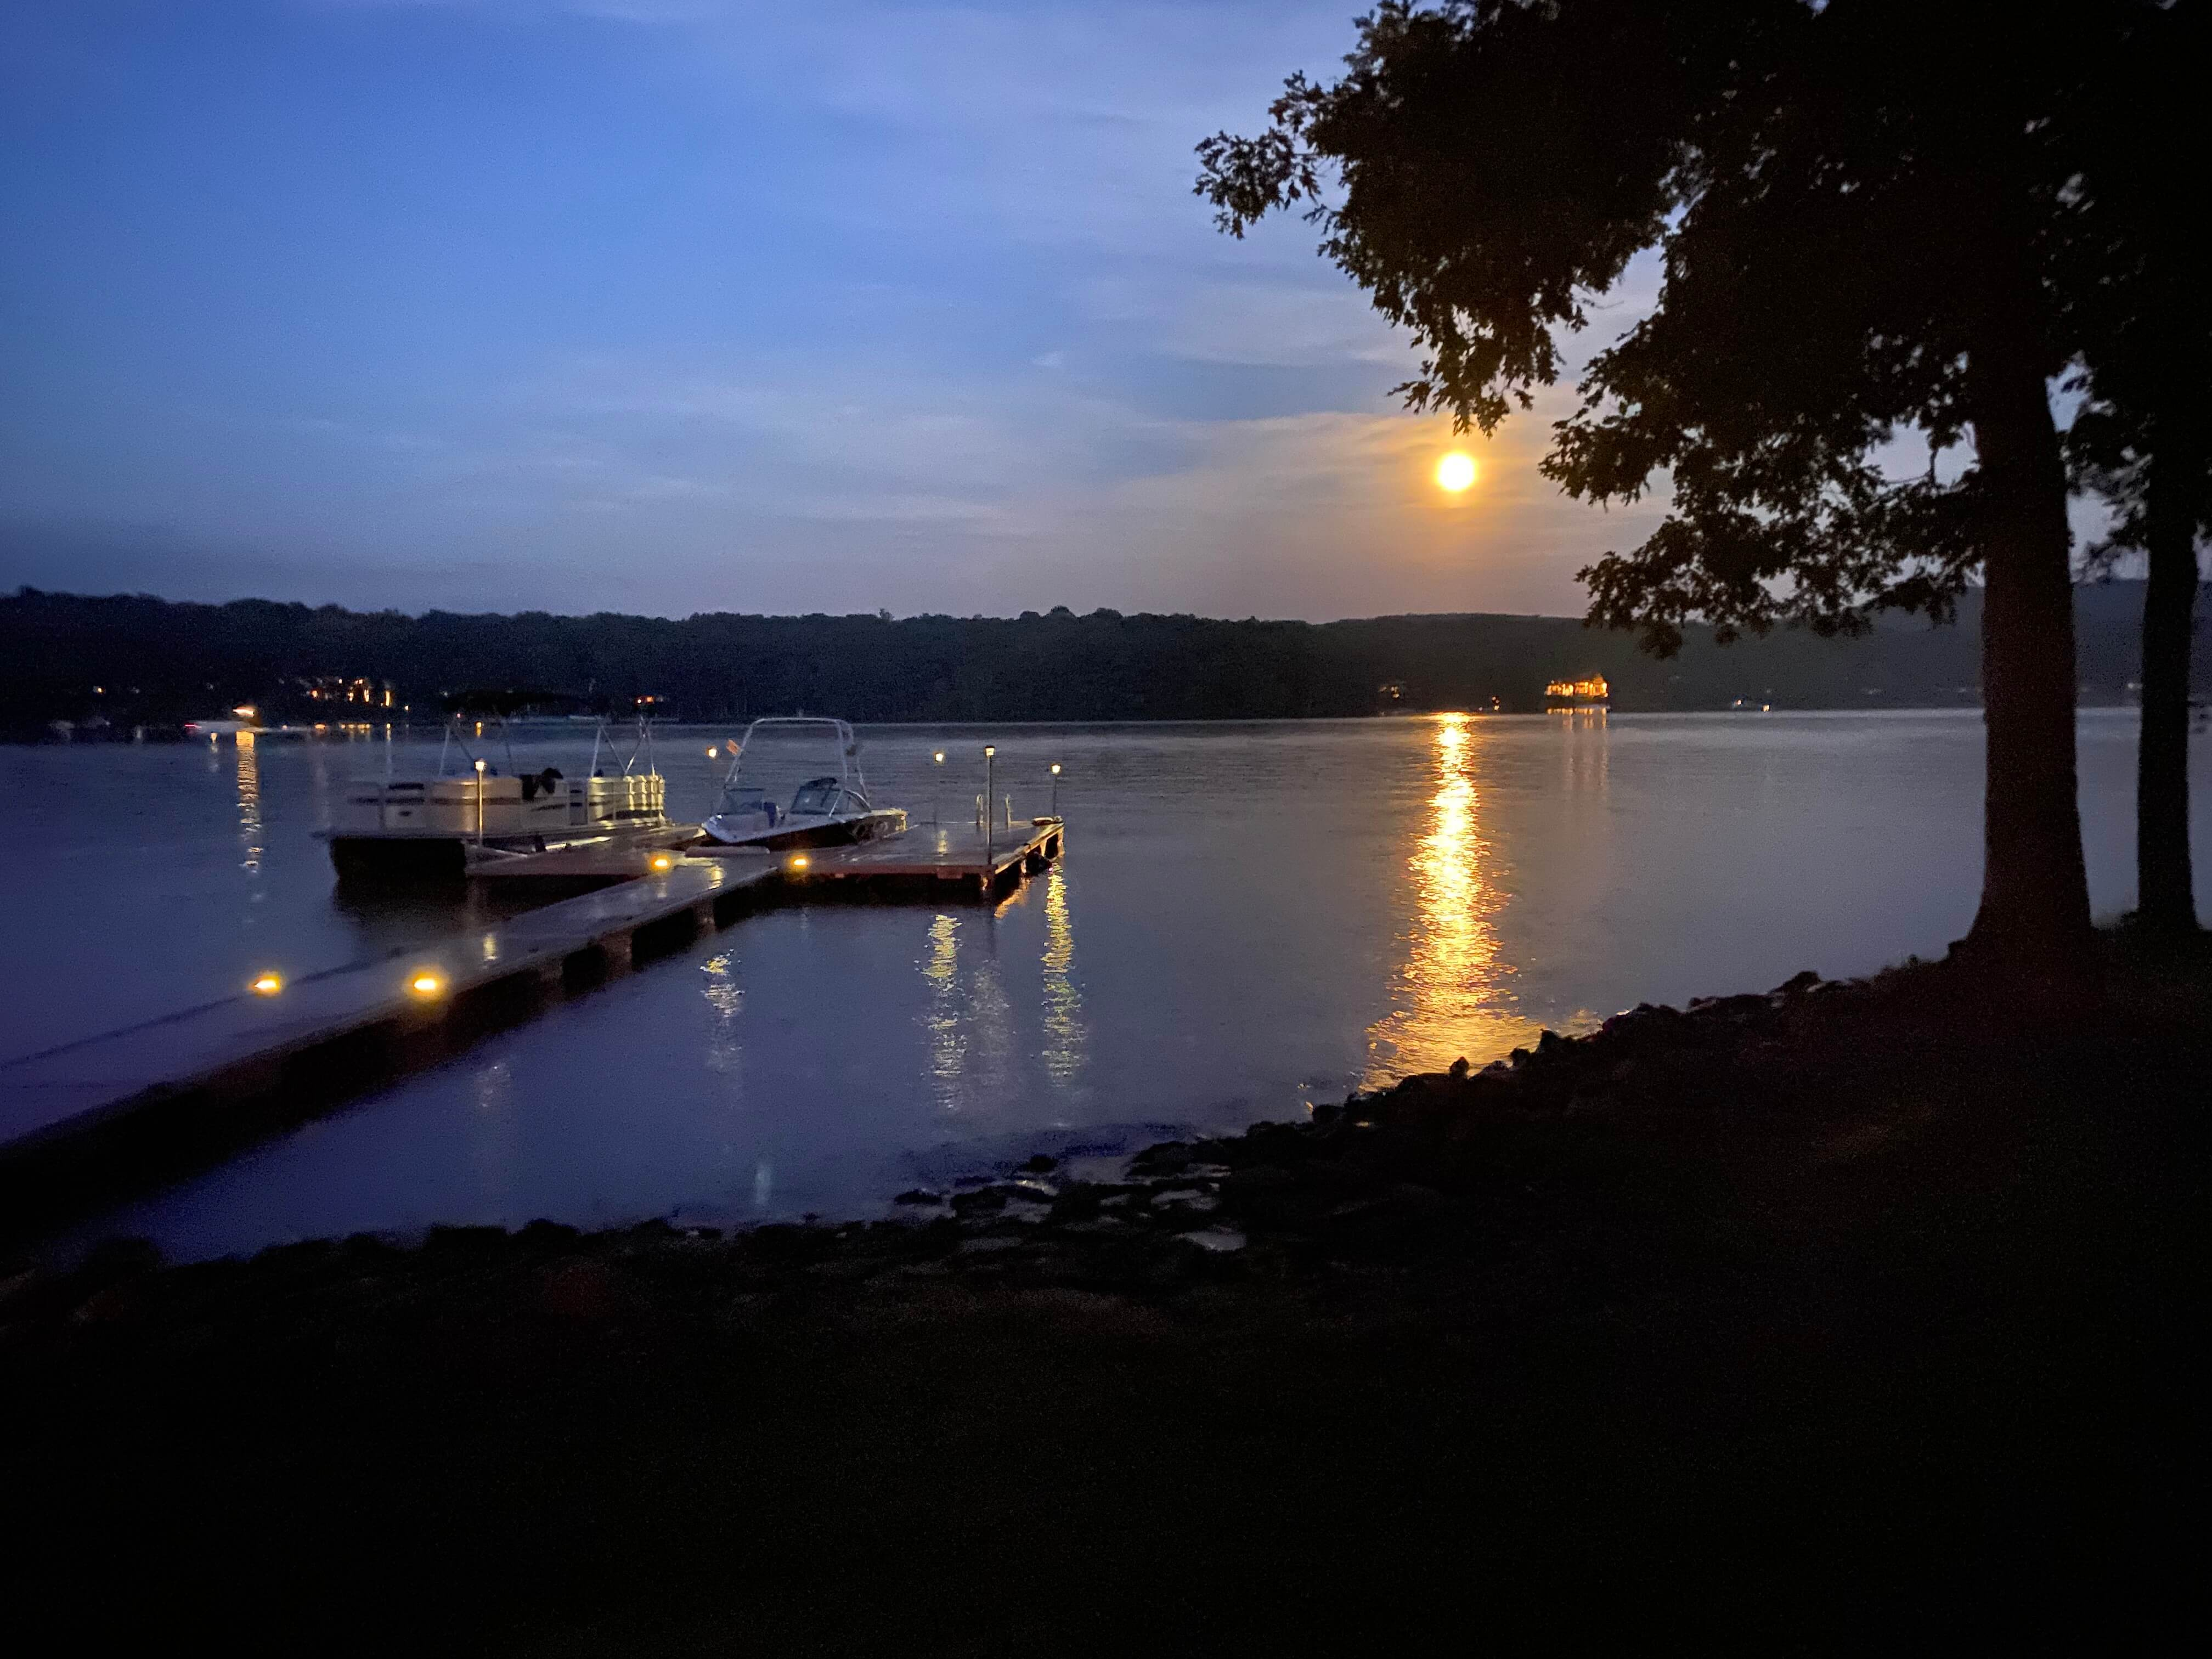 Curt Schnur Moon at Deep Creek Lake, MD